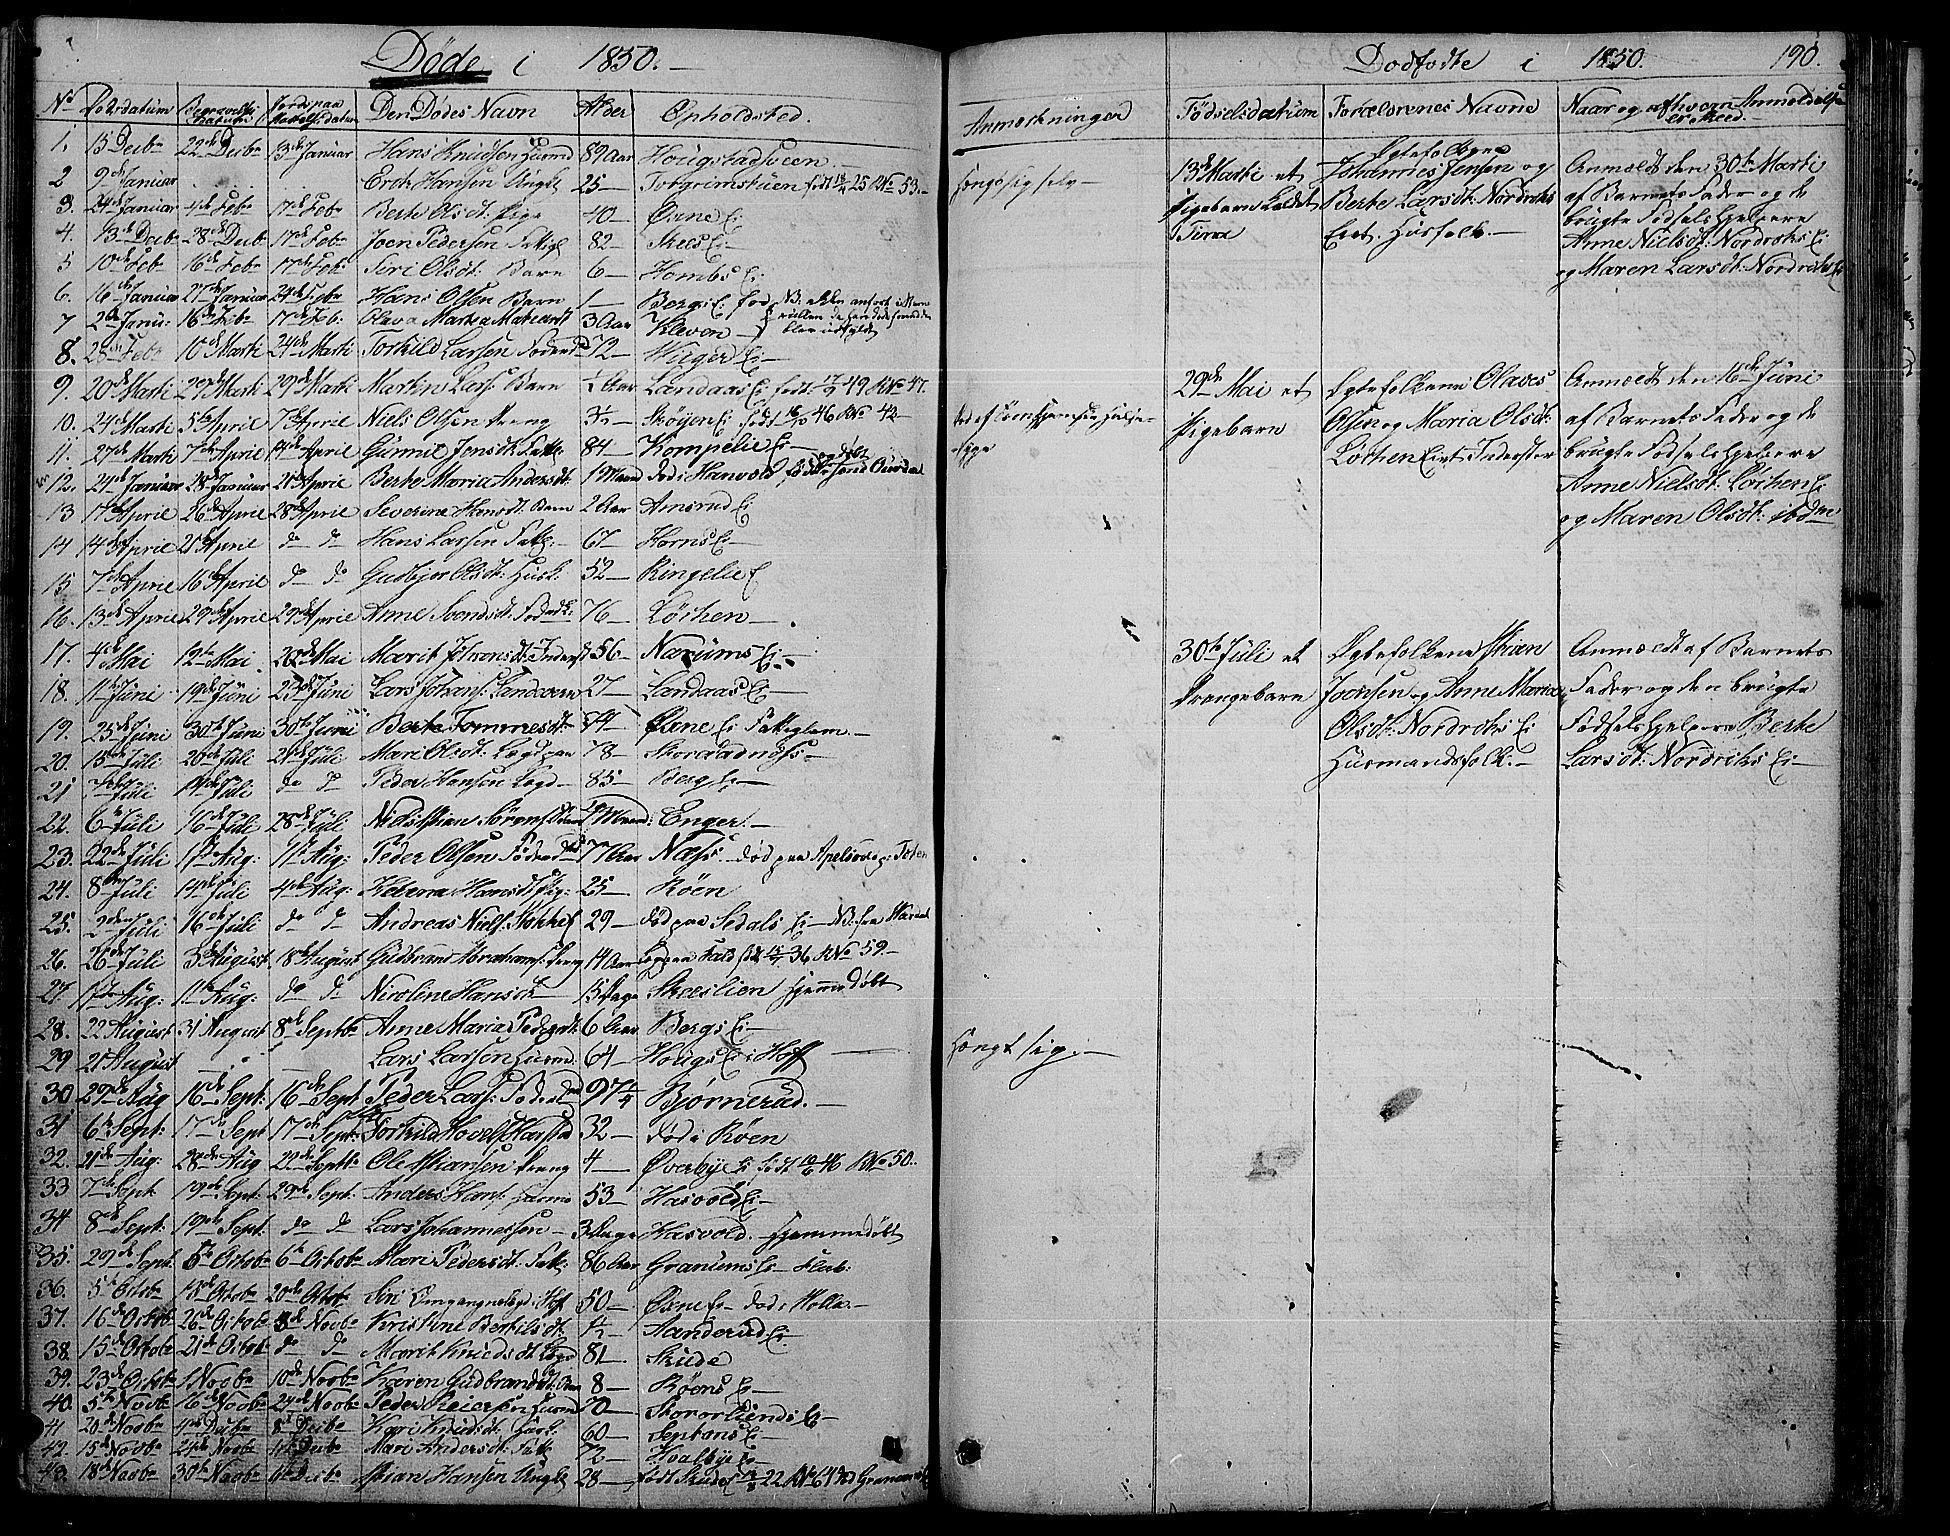 SAH, Søndre Land prestekontor, L/L0001: Klokkerbok nr. 1, 1849-1883, s. 190